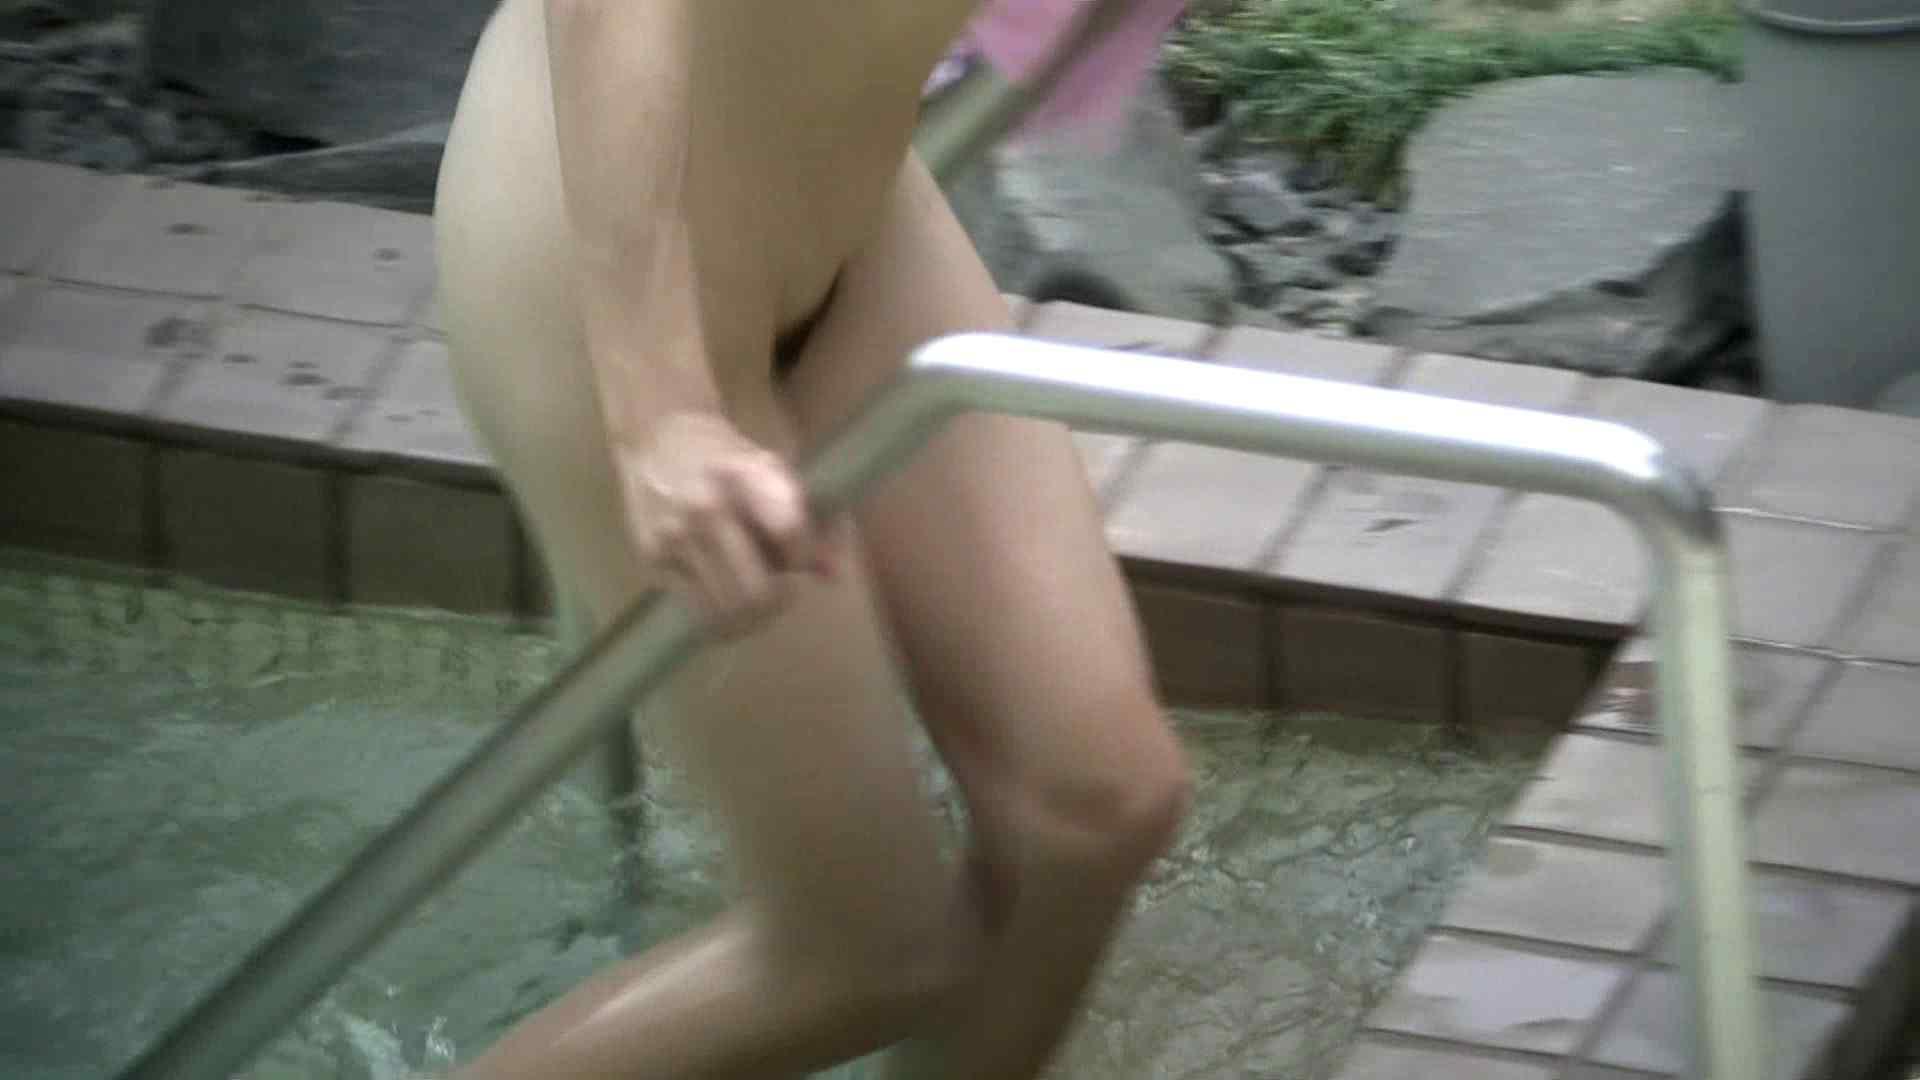 Aquaな露天風呂Vol.654 OLすけべ画像   盗撮  38連発 4